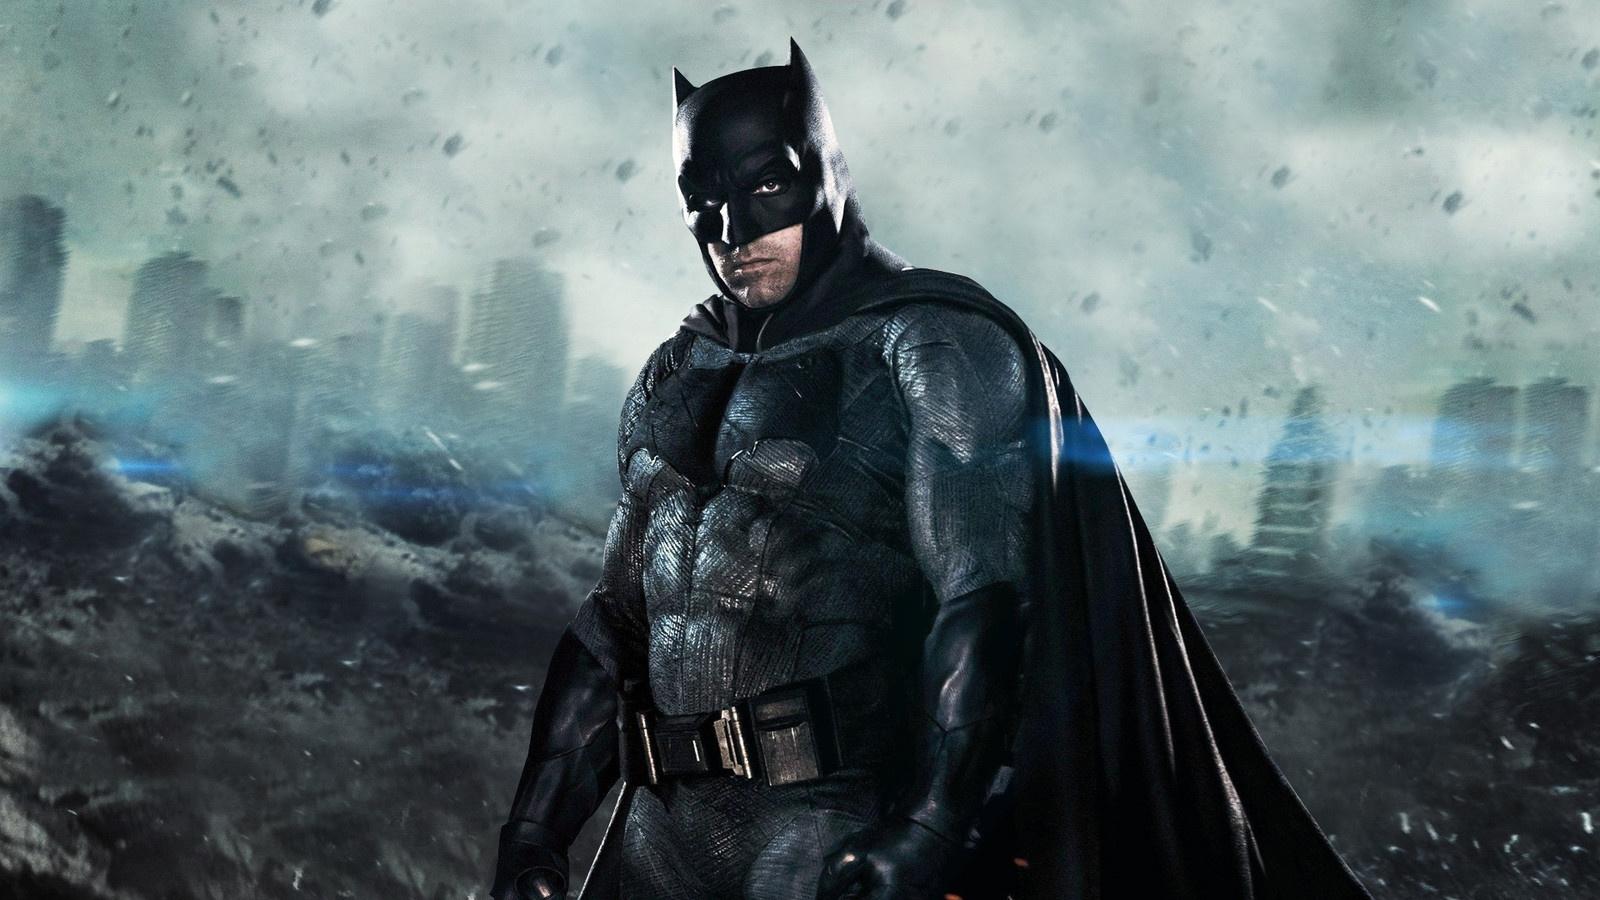 ben affleck ne réalisera finalement pas the batman - sebiwan dans